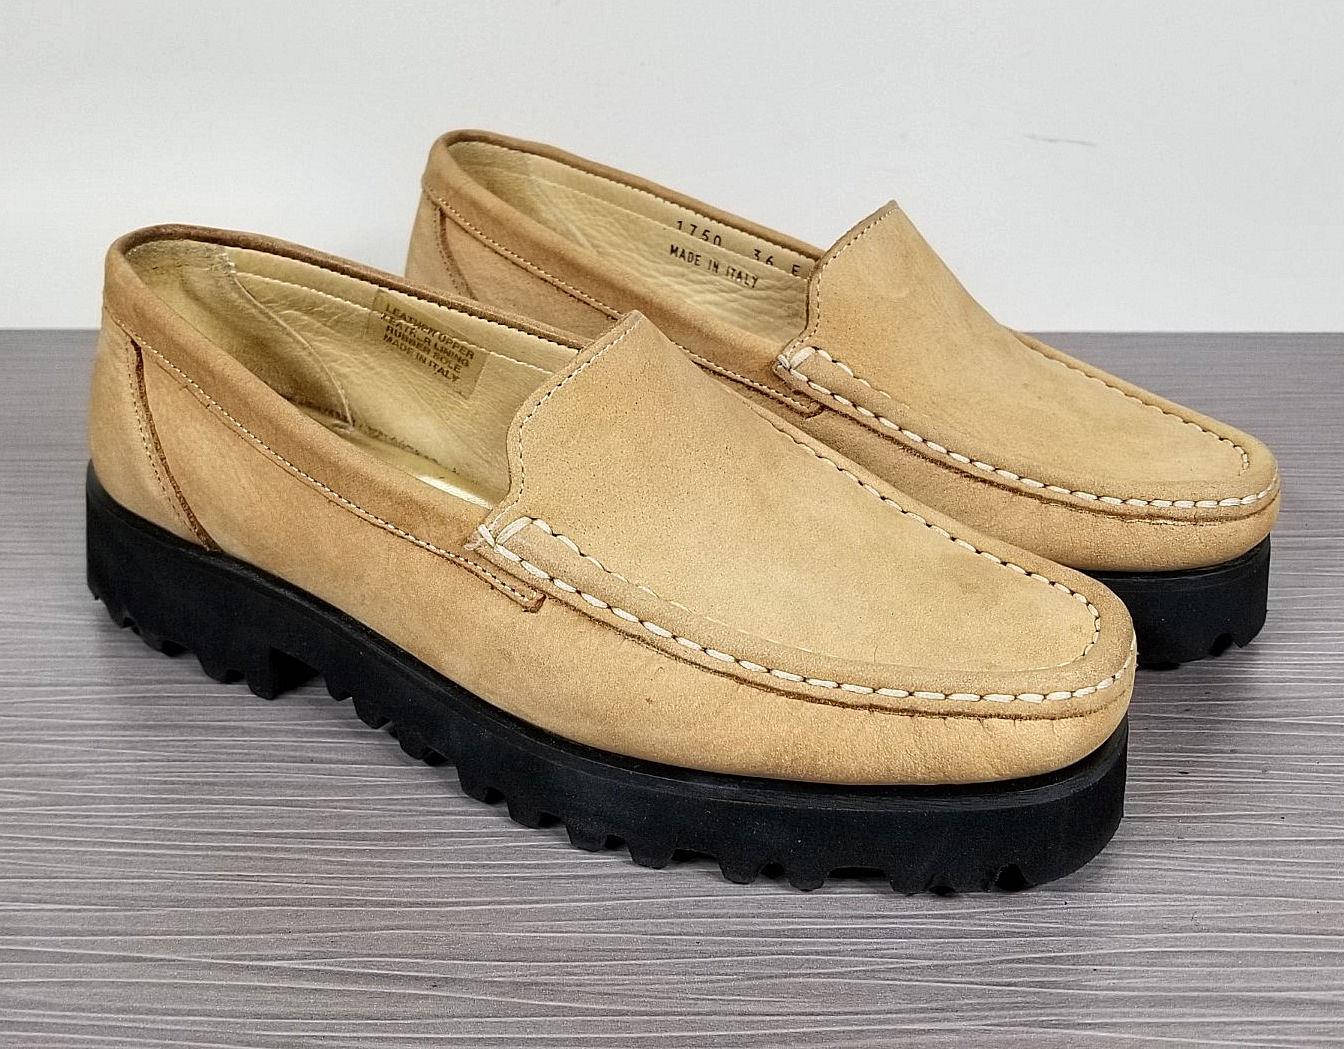 Ron White 'Rita' Loafer, Sand Nubuck Leather, Womens Size 5.5 / 36 E